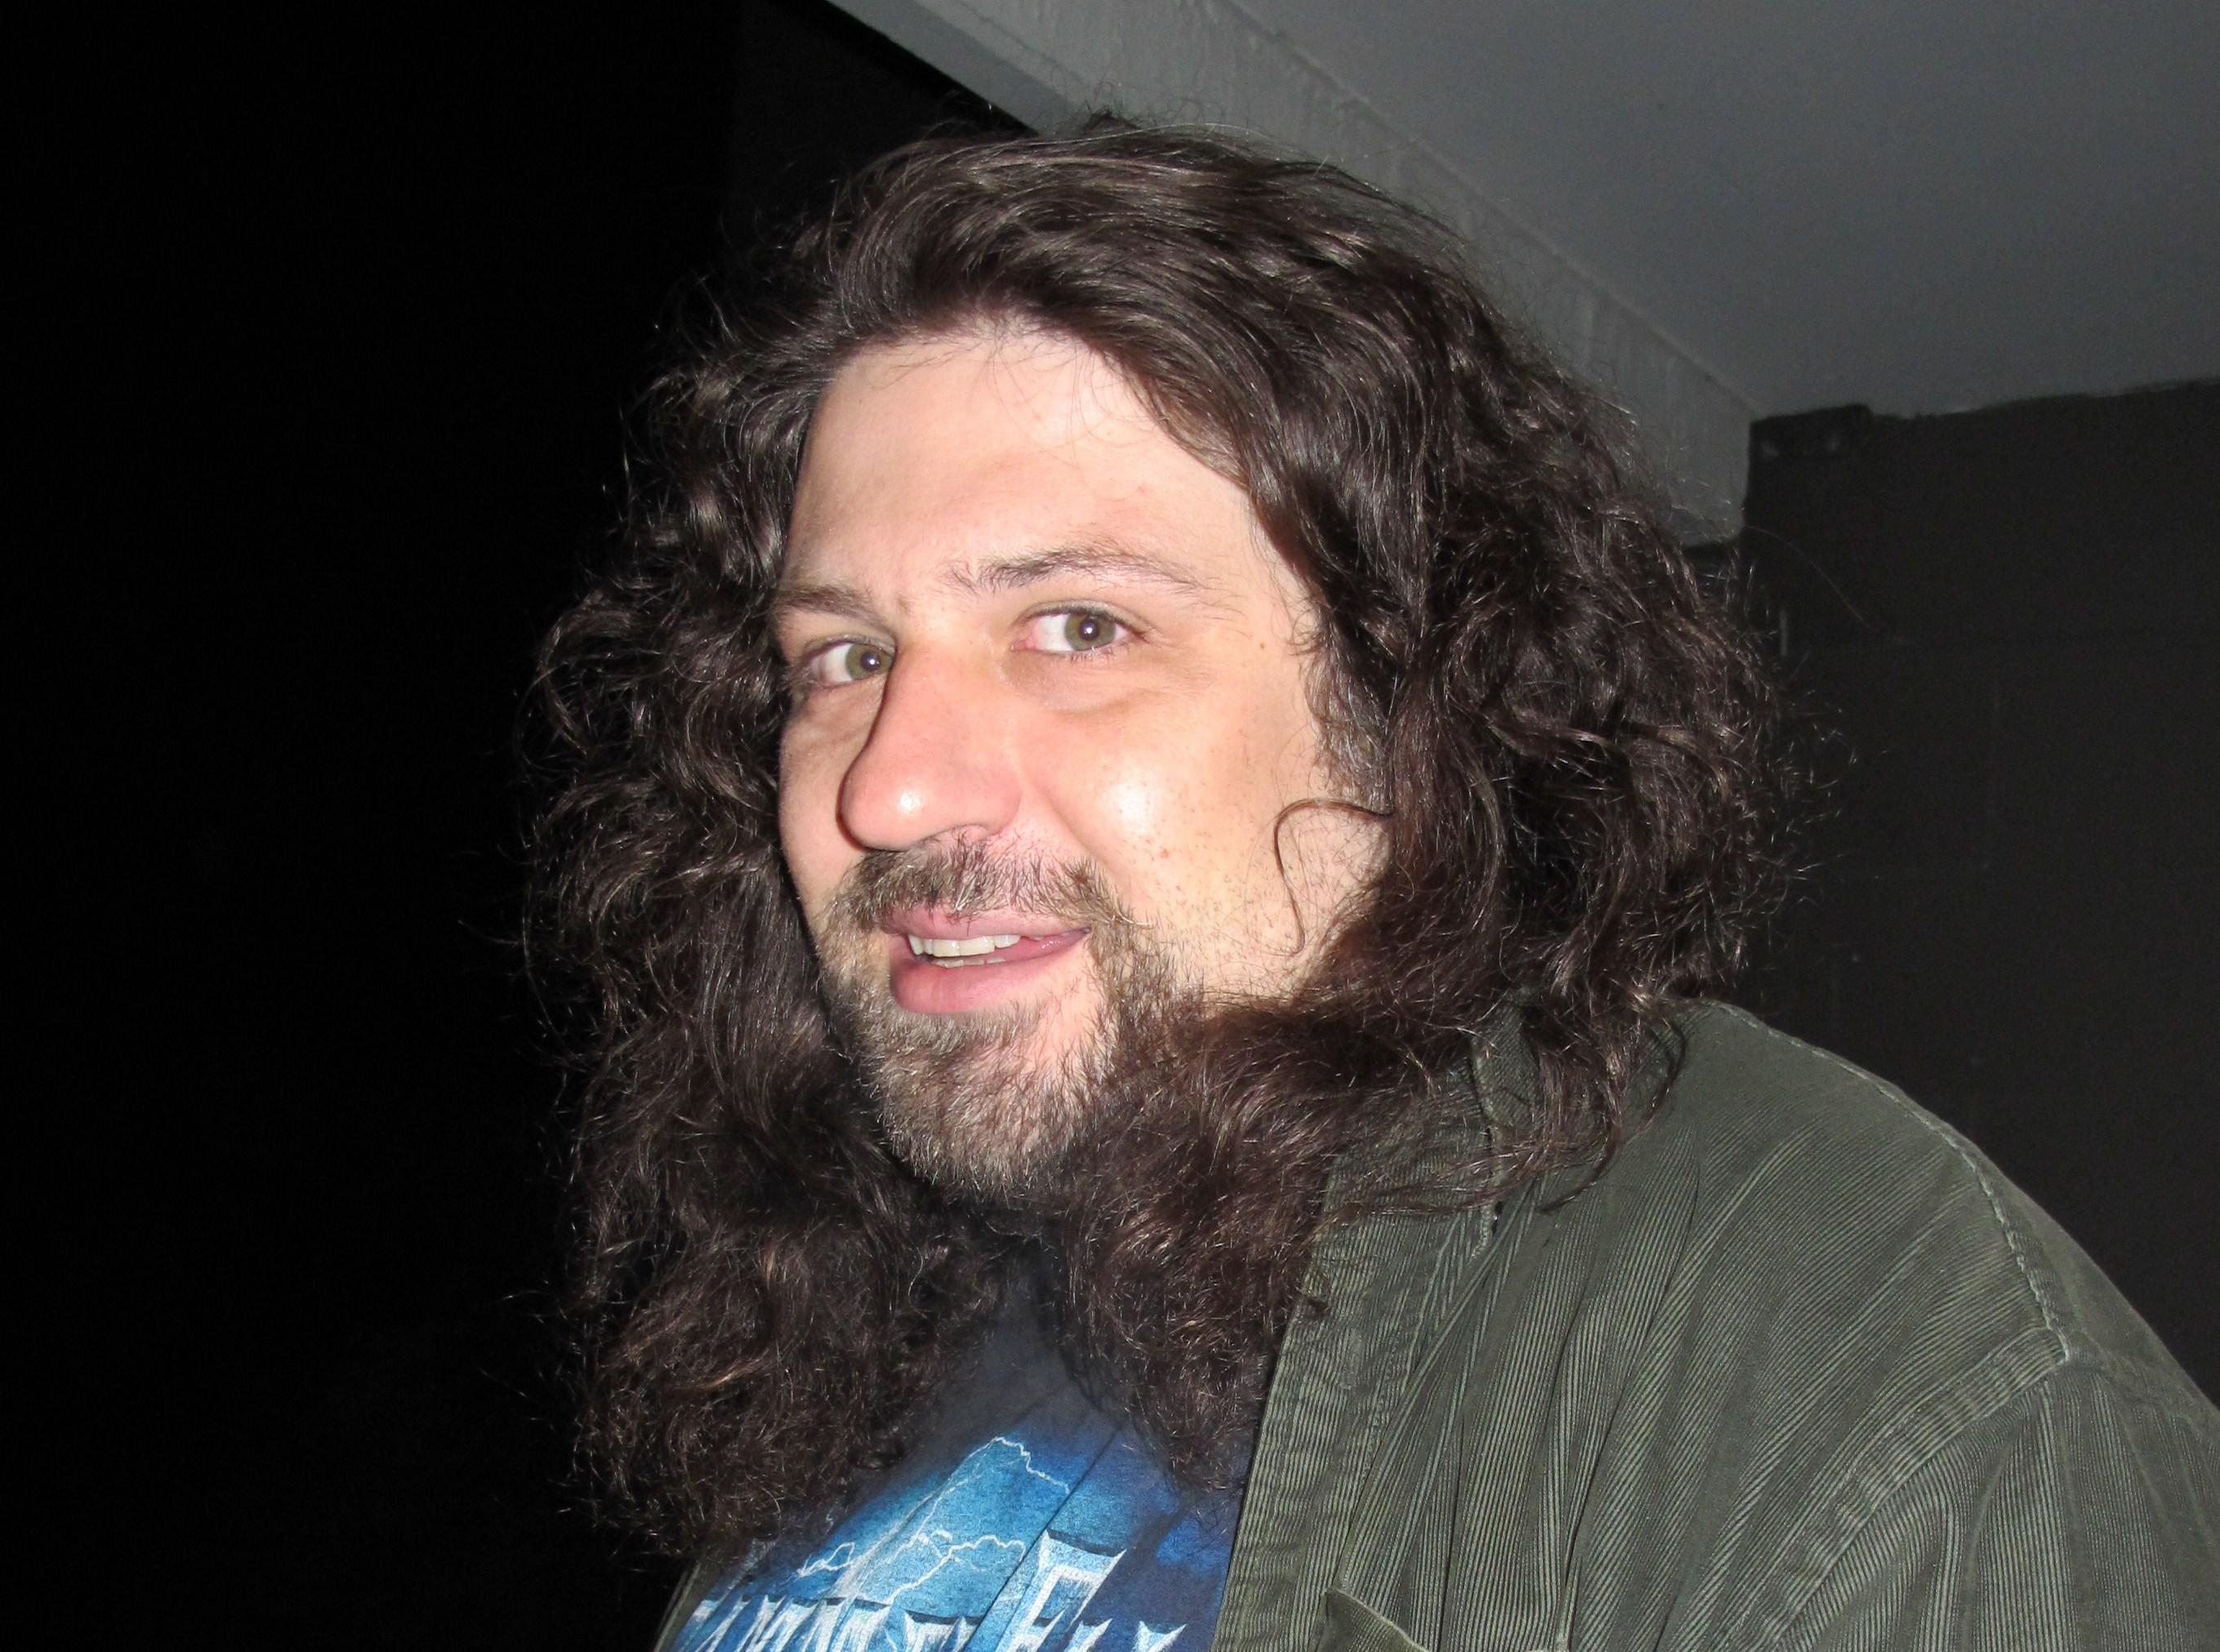 Marc Halupczok